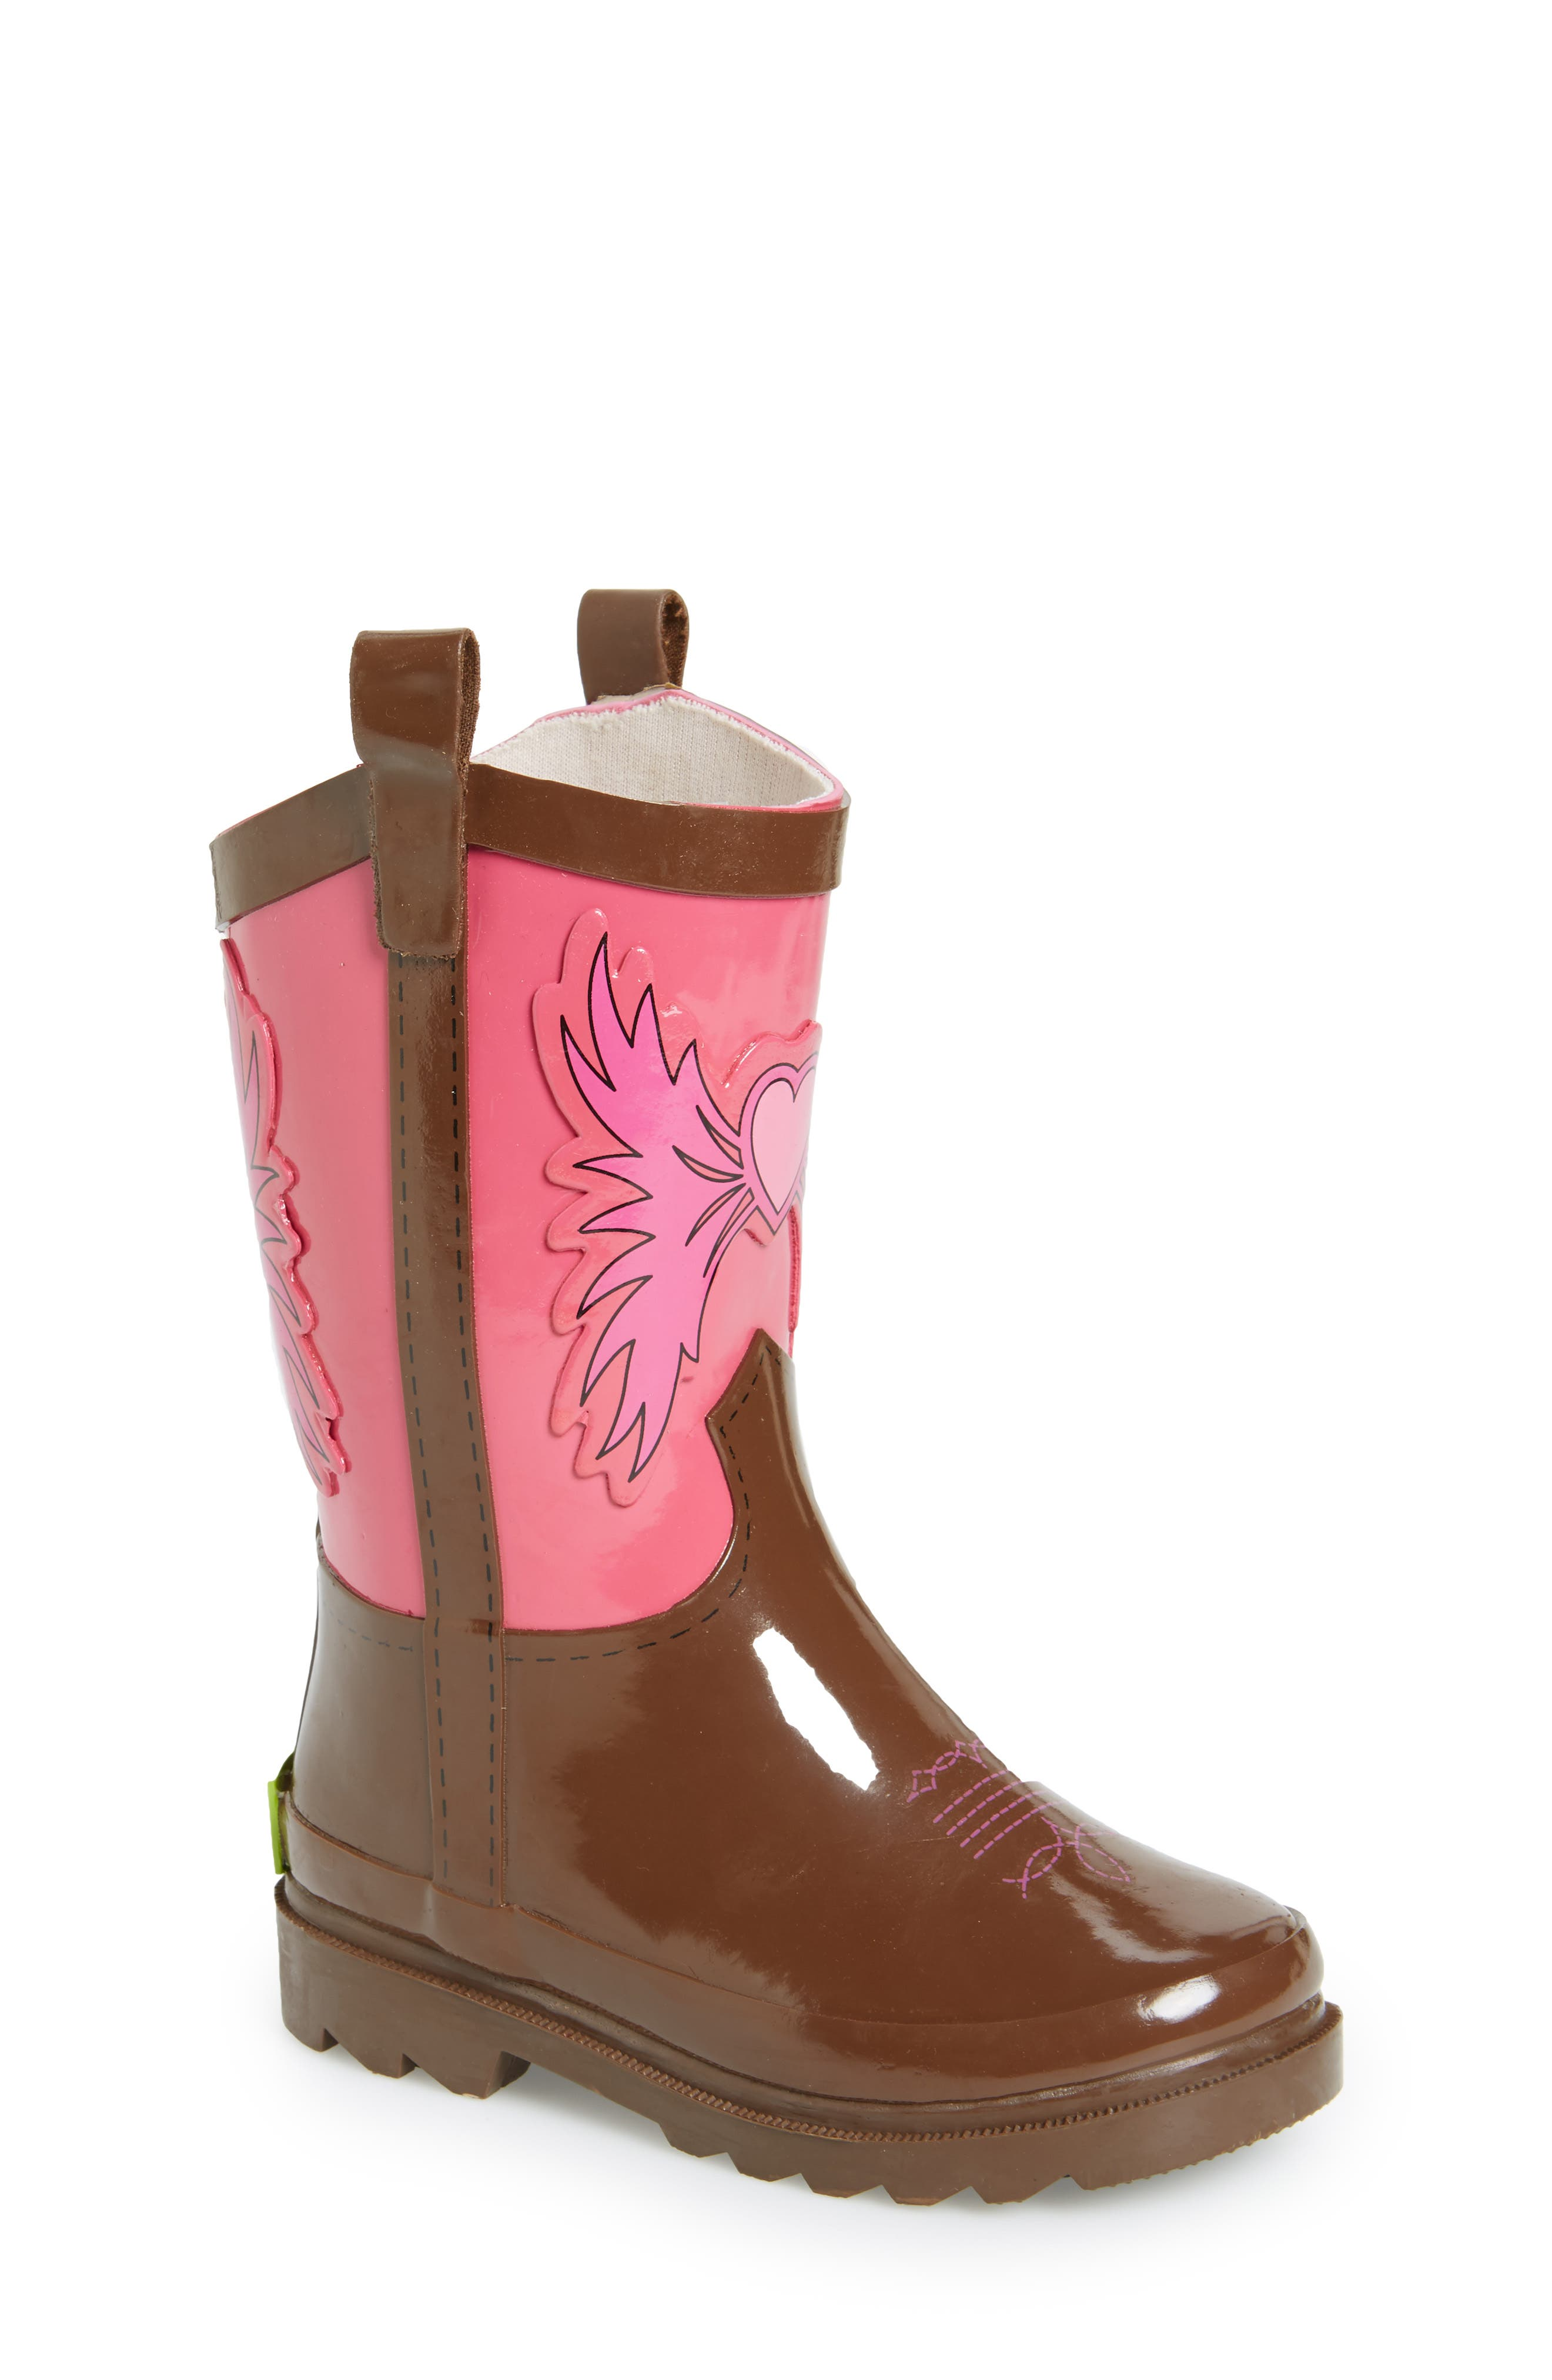 Cowgirl Waterproof Rain Boot,                             Main thumbnail 1, color,                             680